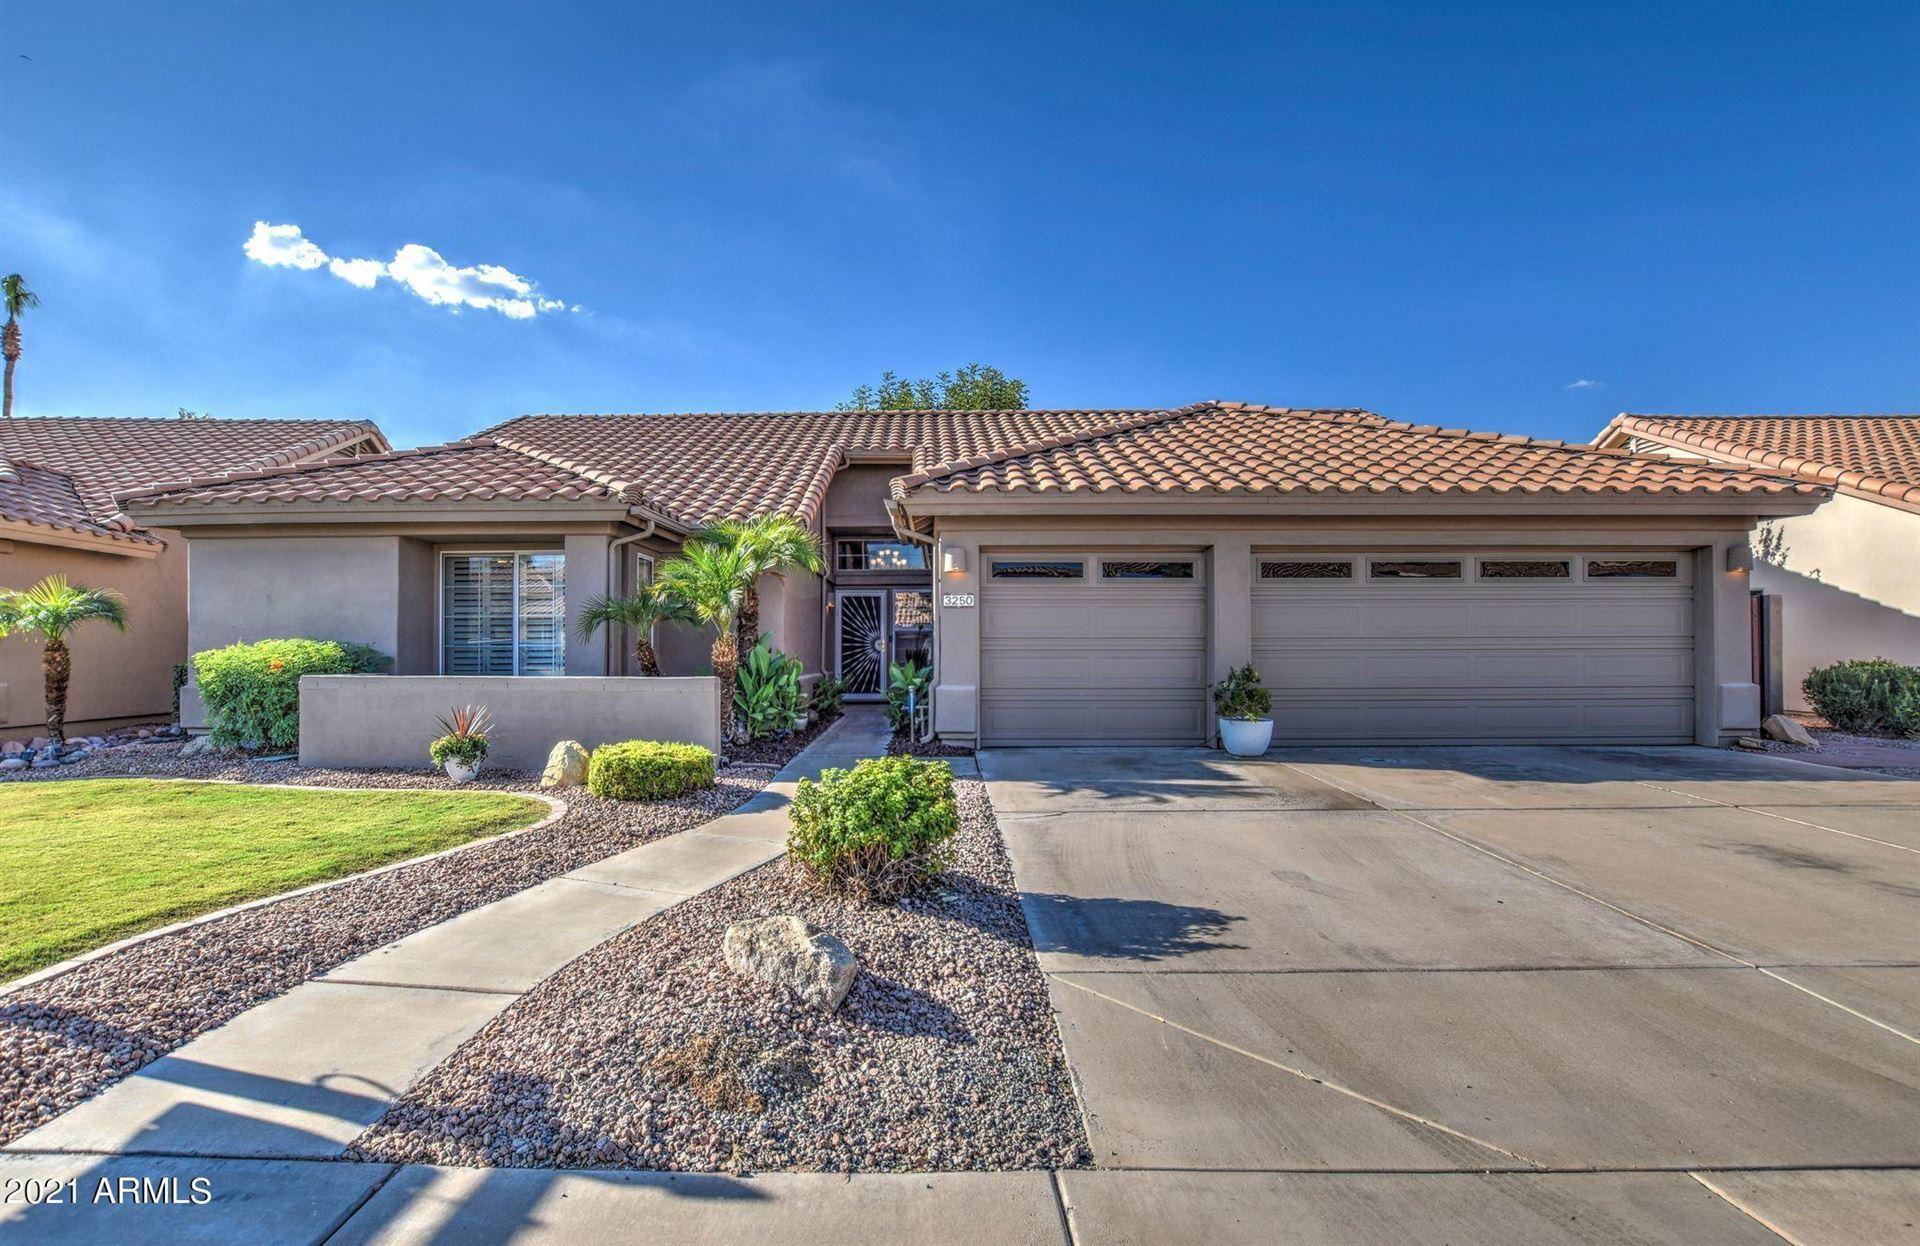 3250 W IRONWOOD Drive, Chandler, AZ 85226 - MLS#: 6256254